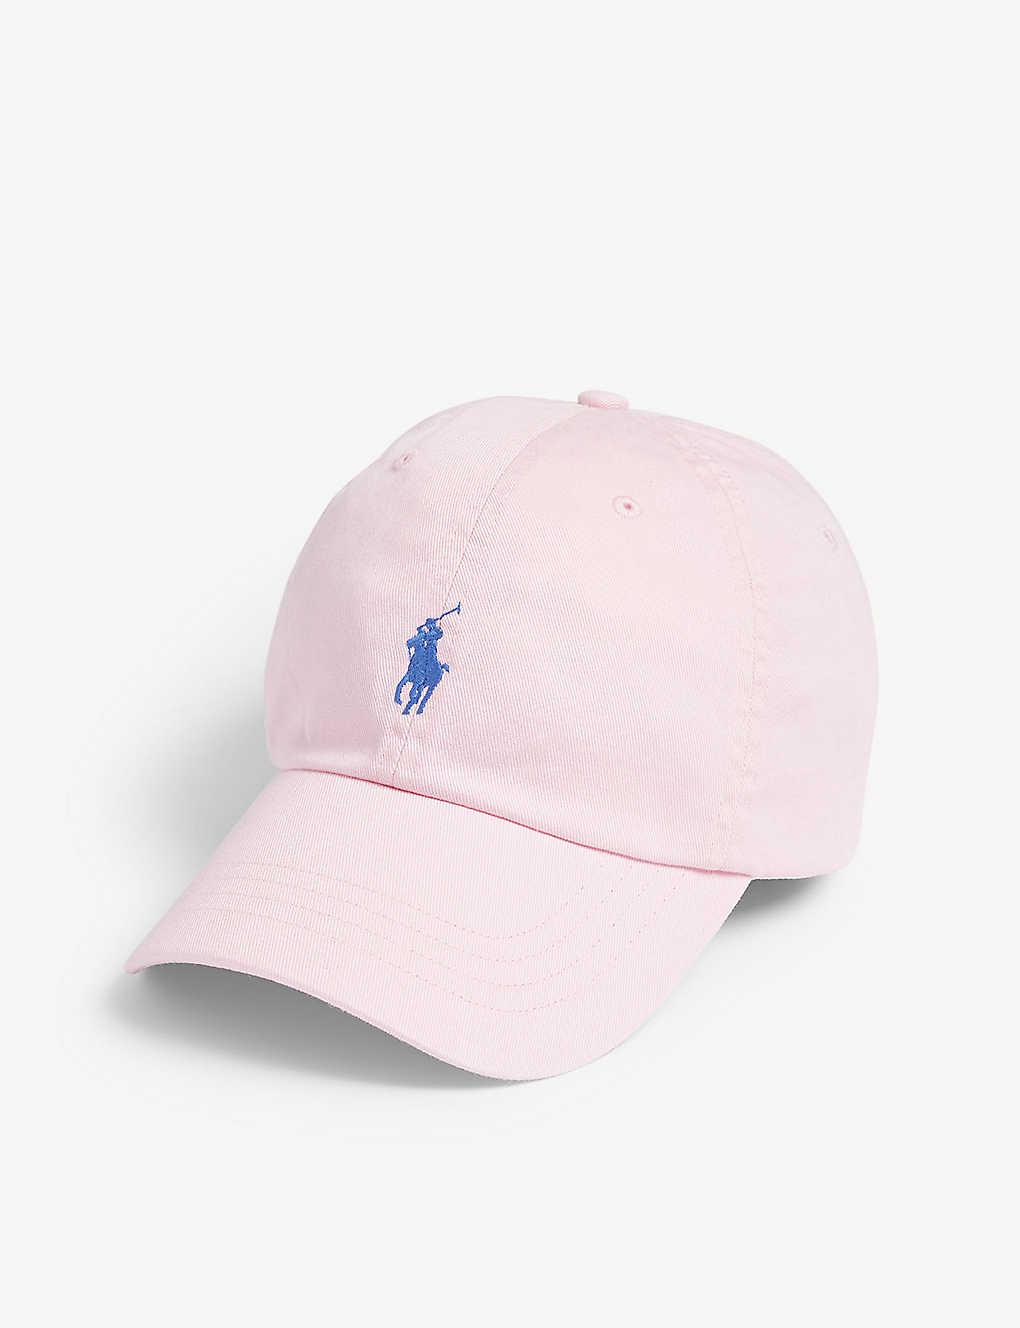 2b65d417 POLO RALPH LAUREN - Pony baseball cap | Selfridges.com